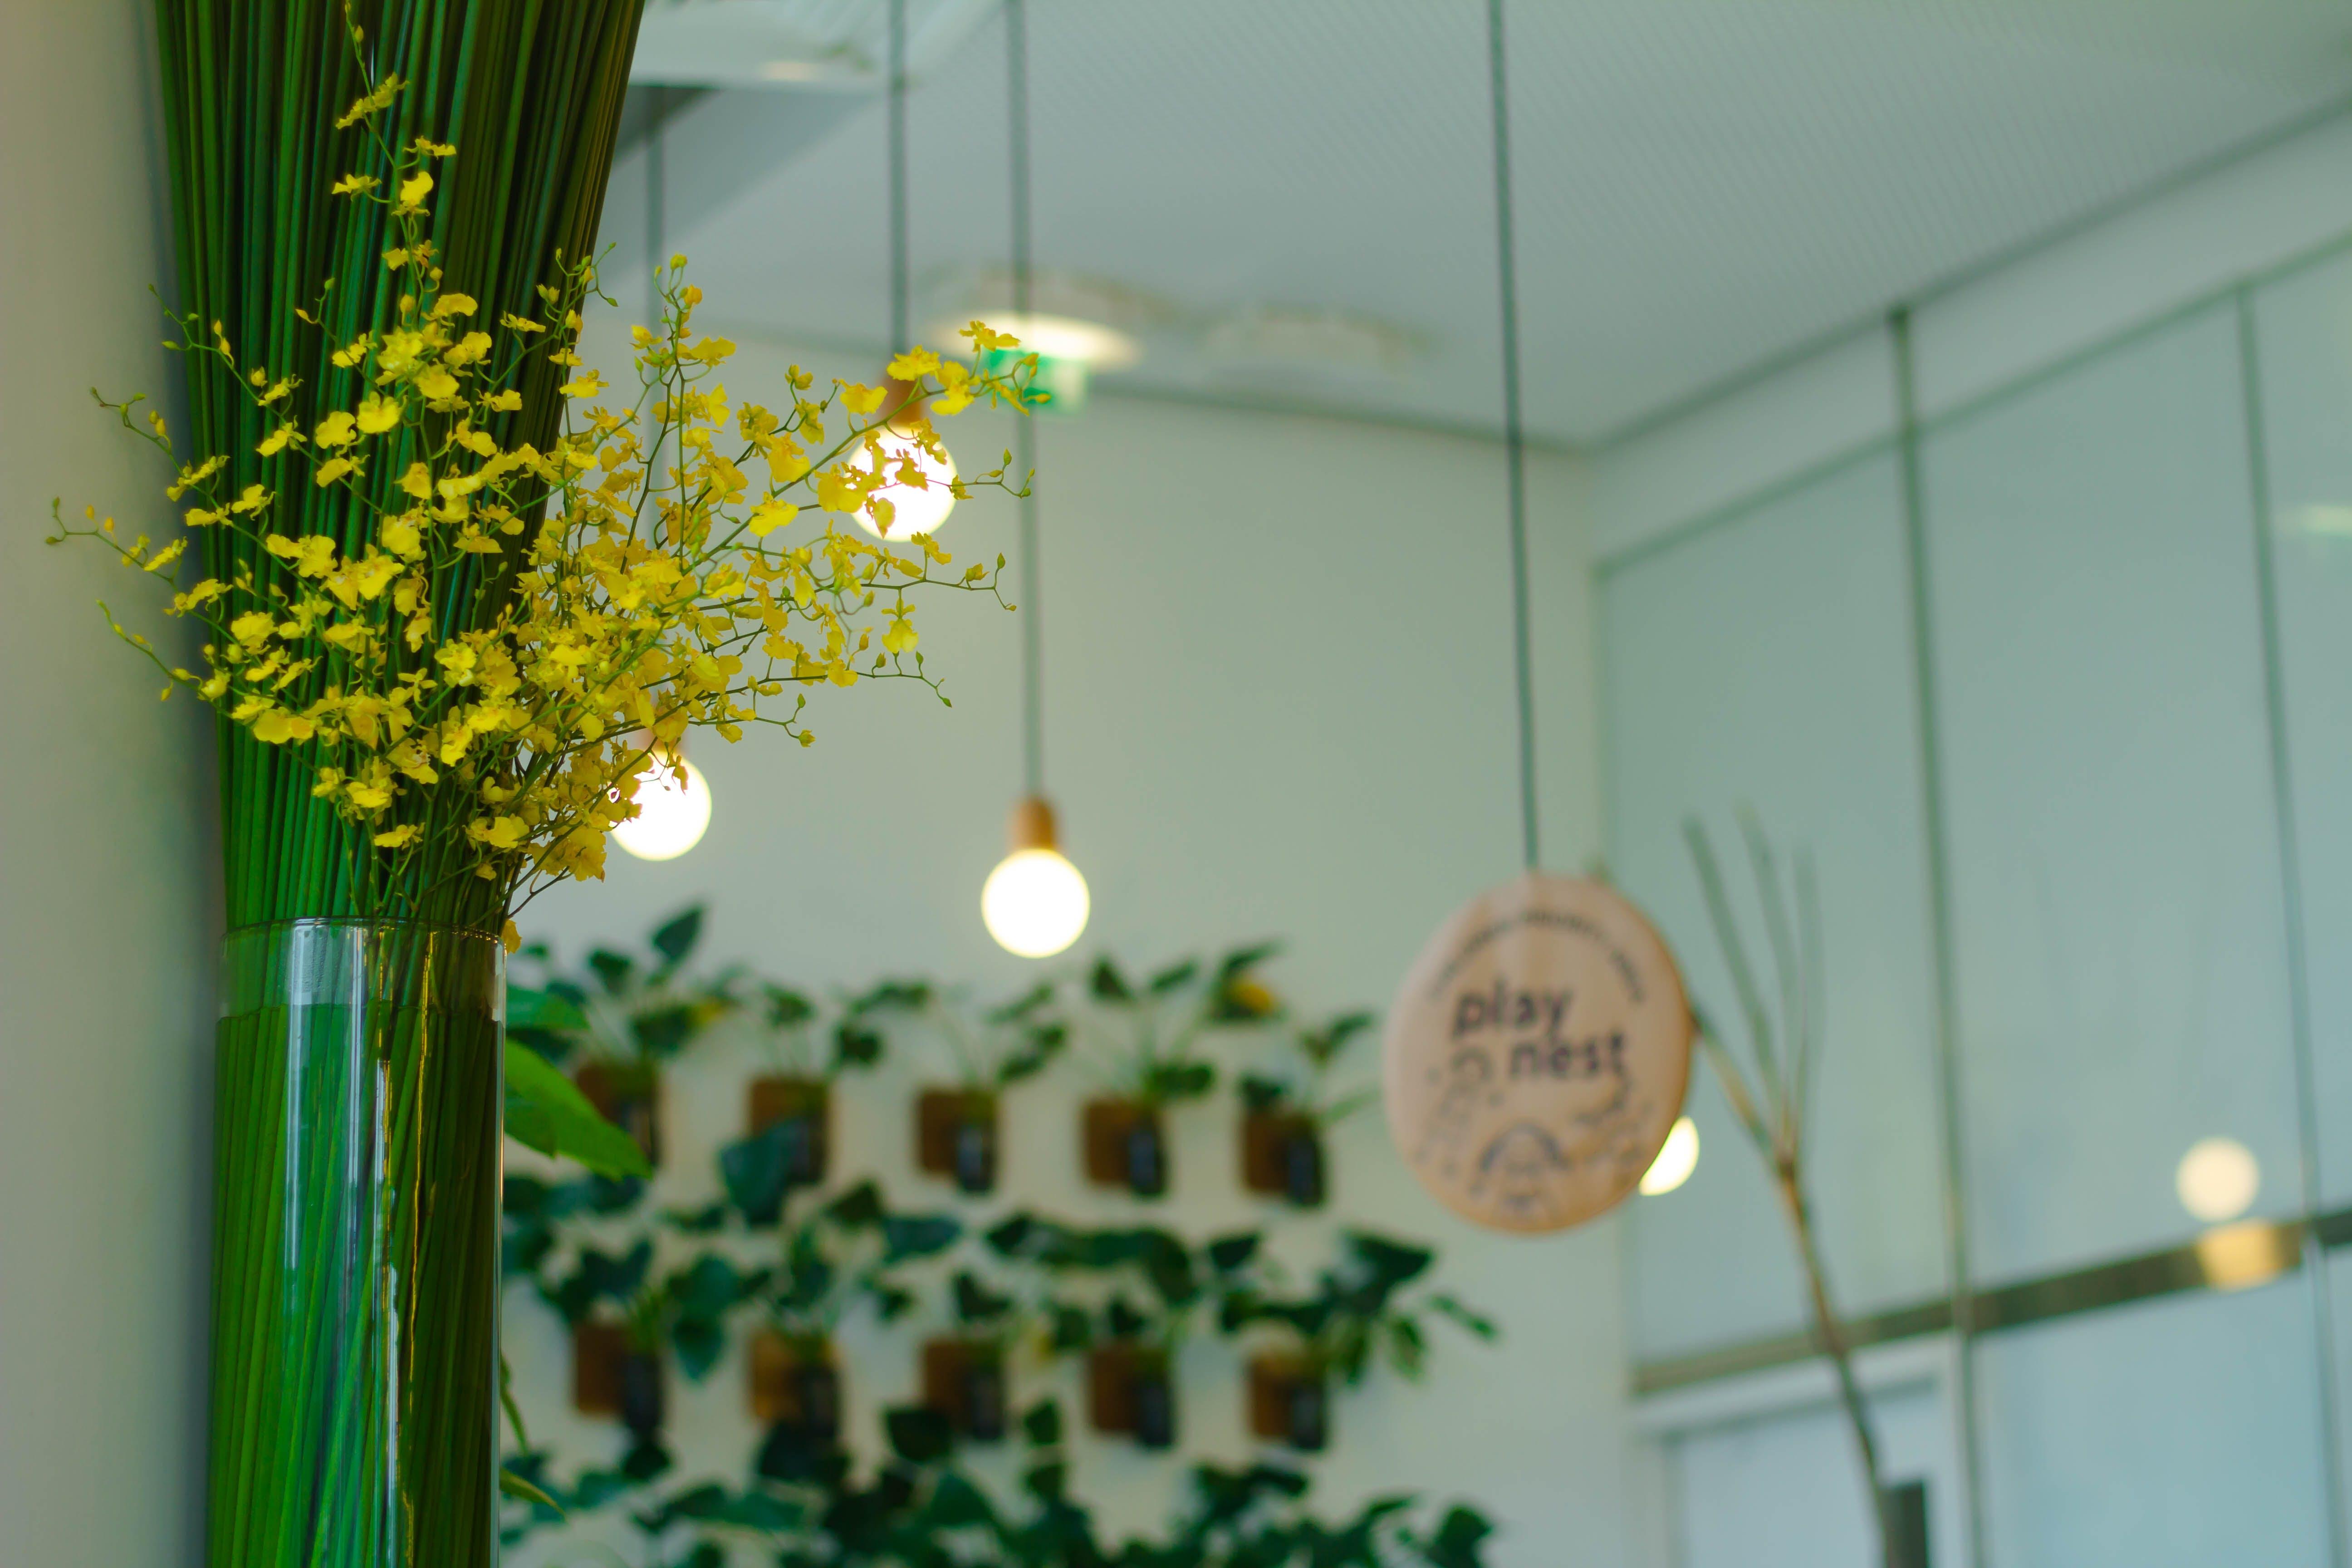 Yellow Flower Wall Decor Inside Room